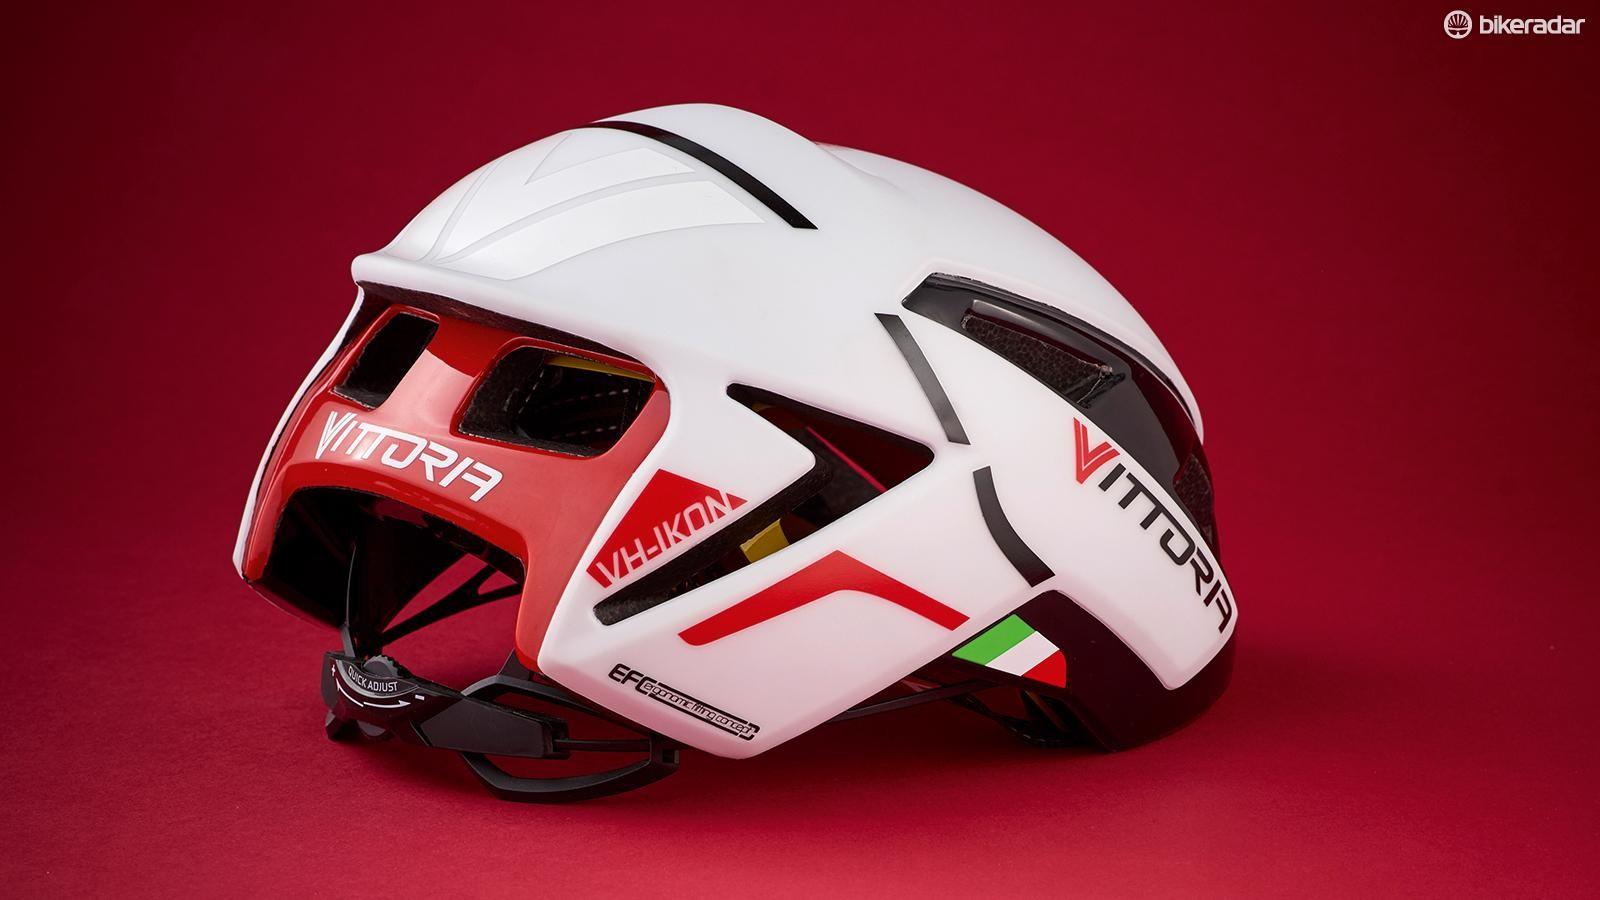 Vittoria's VH-Ikon MIPS helmet